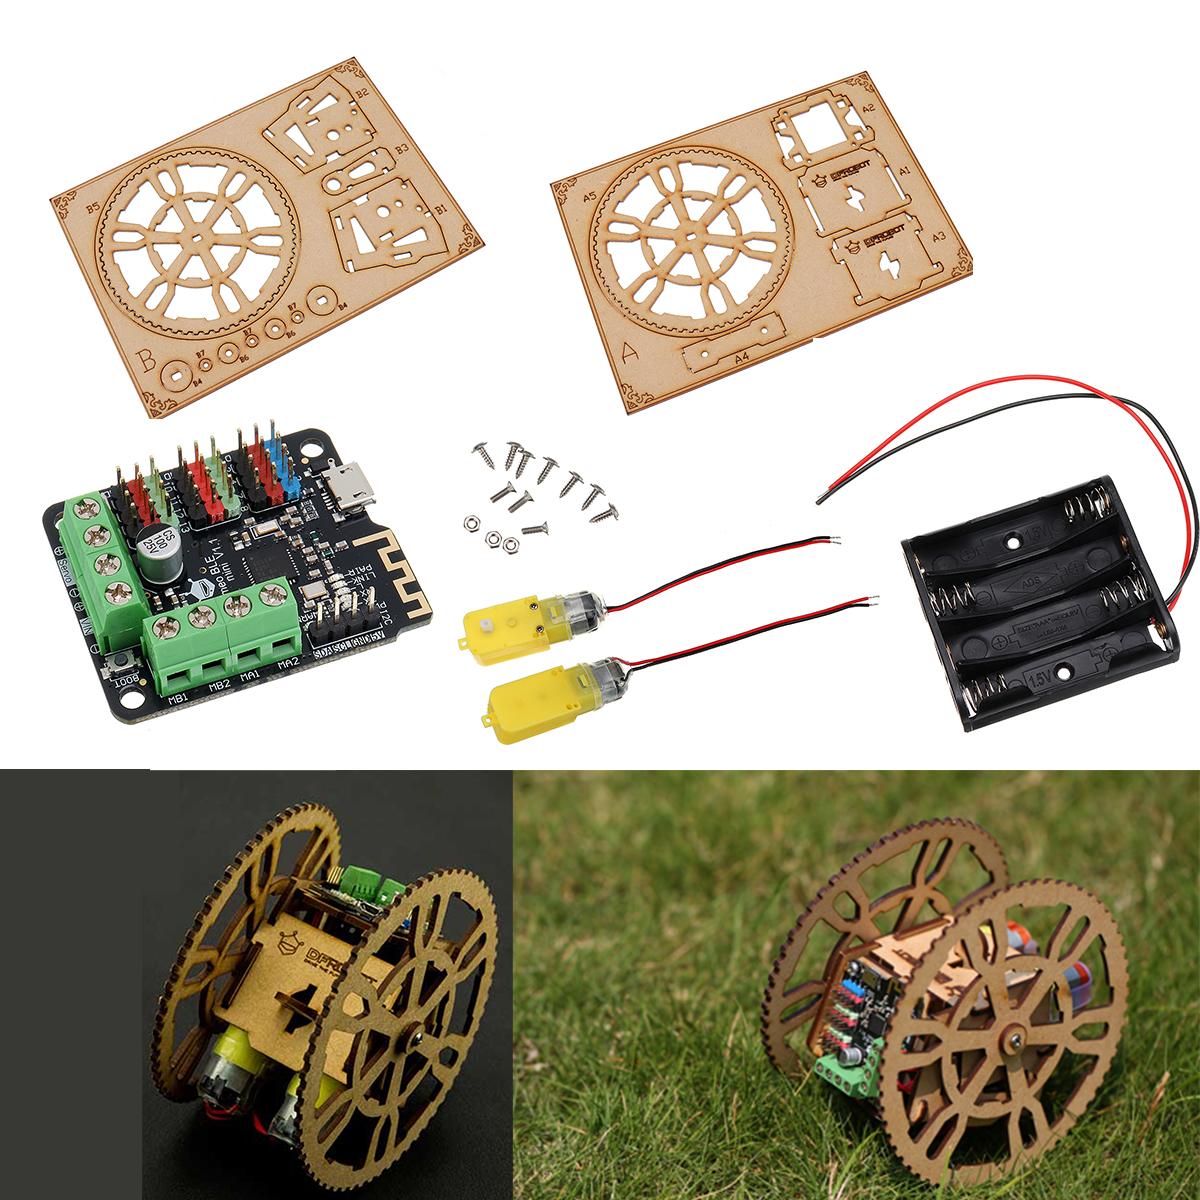 DFRobot FlameWheel Remote Control Smart Robot DIY Kit for Arduino Support iOS App